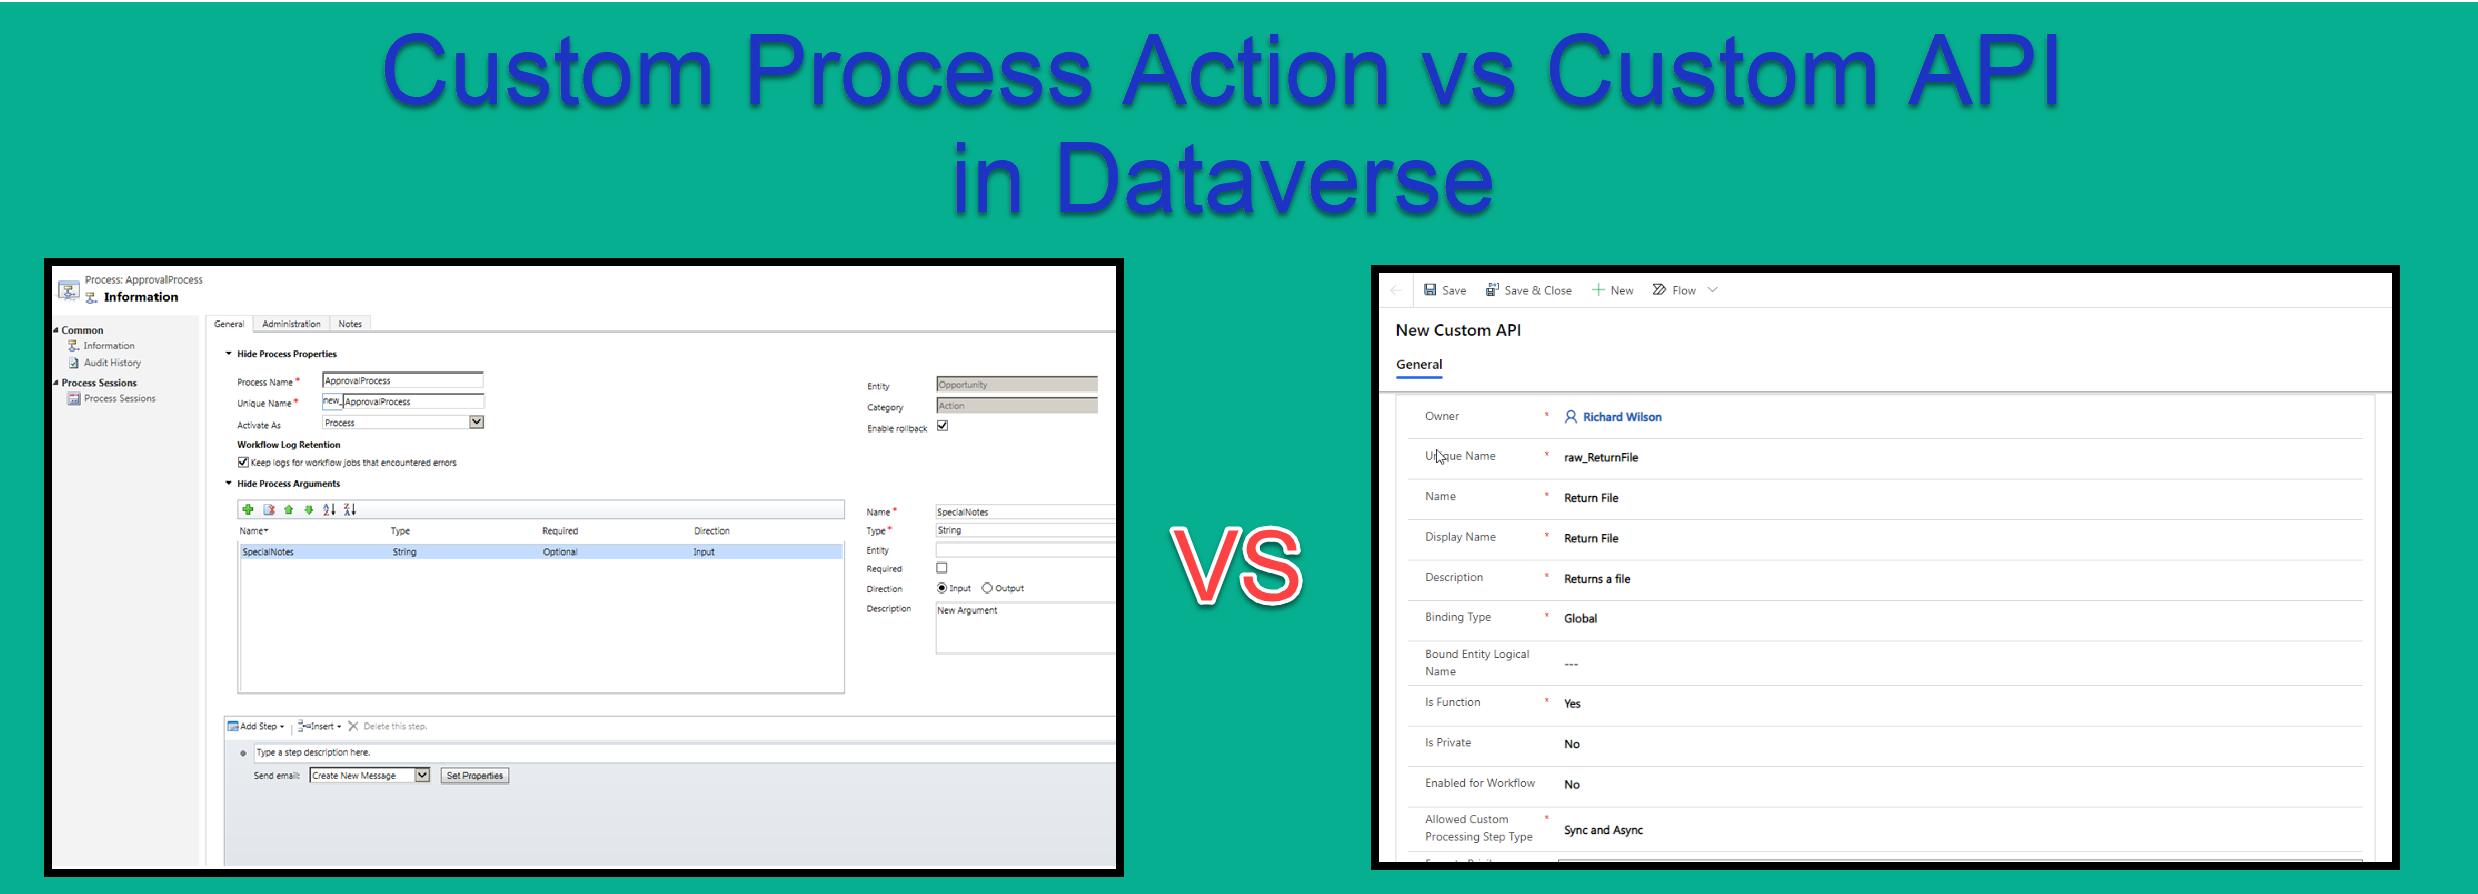 Custom Process Action vs Custom API in Dataverse